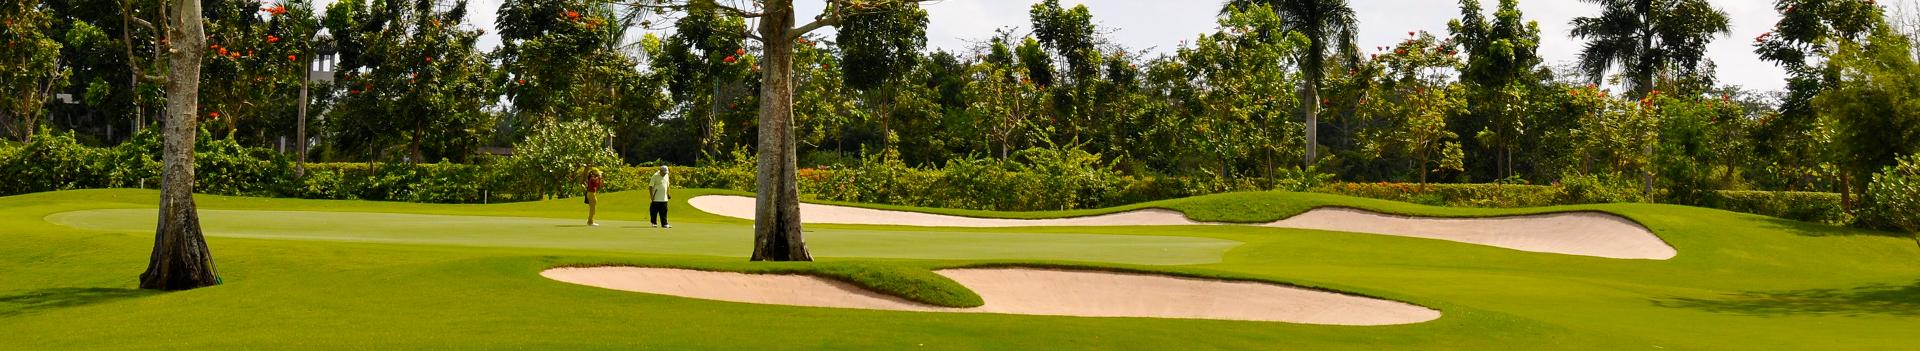 golf mini banner